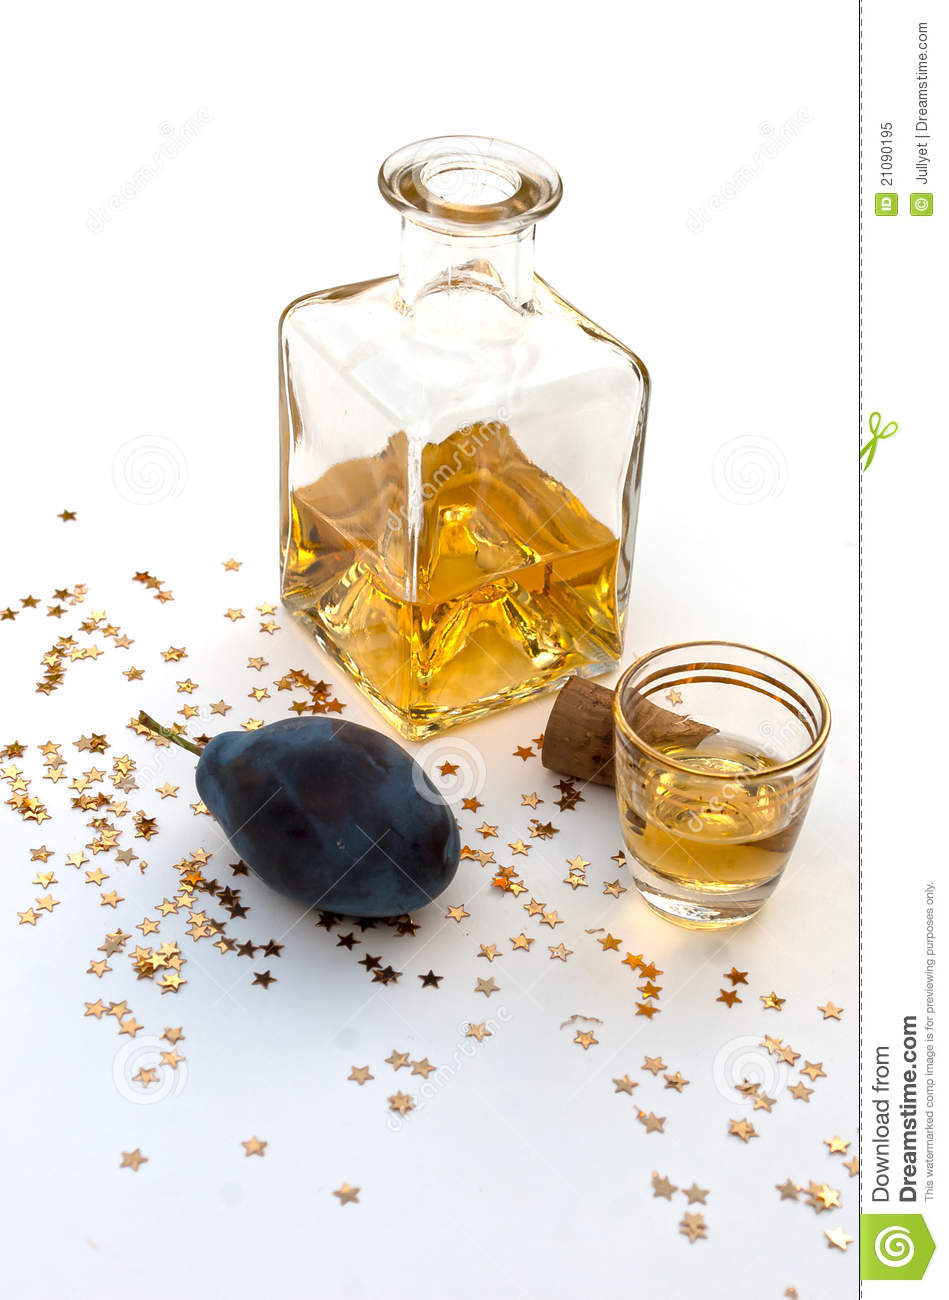 Plum Brandy Royalty Free Stock Photo.